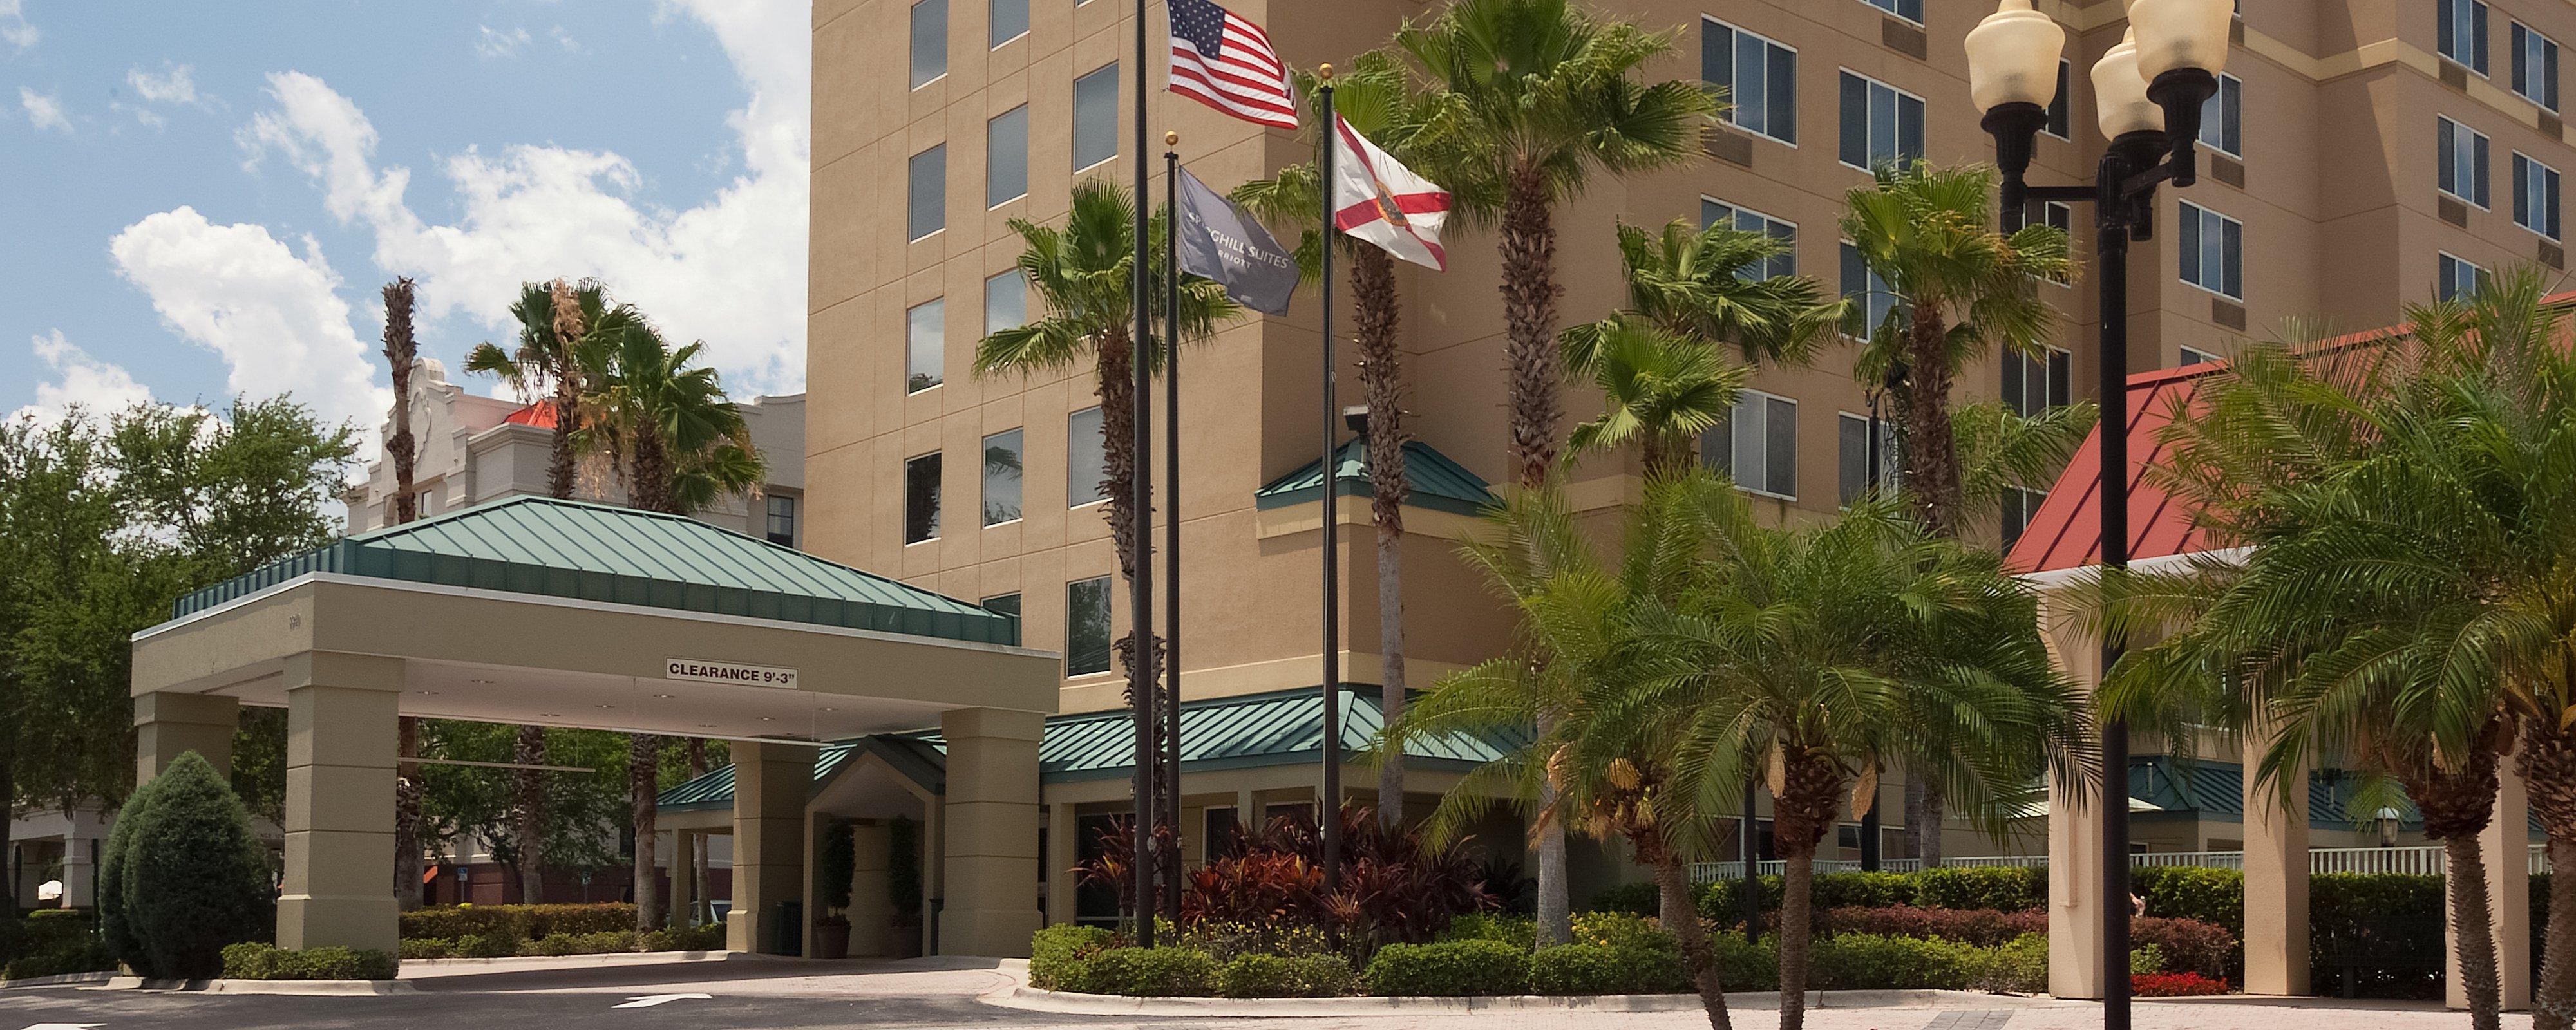 Springhill Suites Orlando Convention Center/international Regarding Orlando Convention Center Schedule September 2021